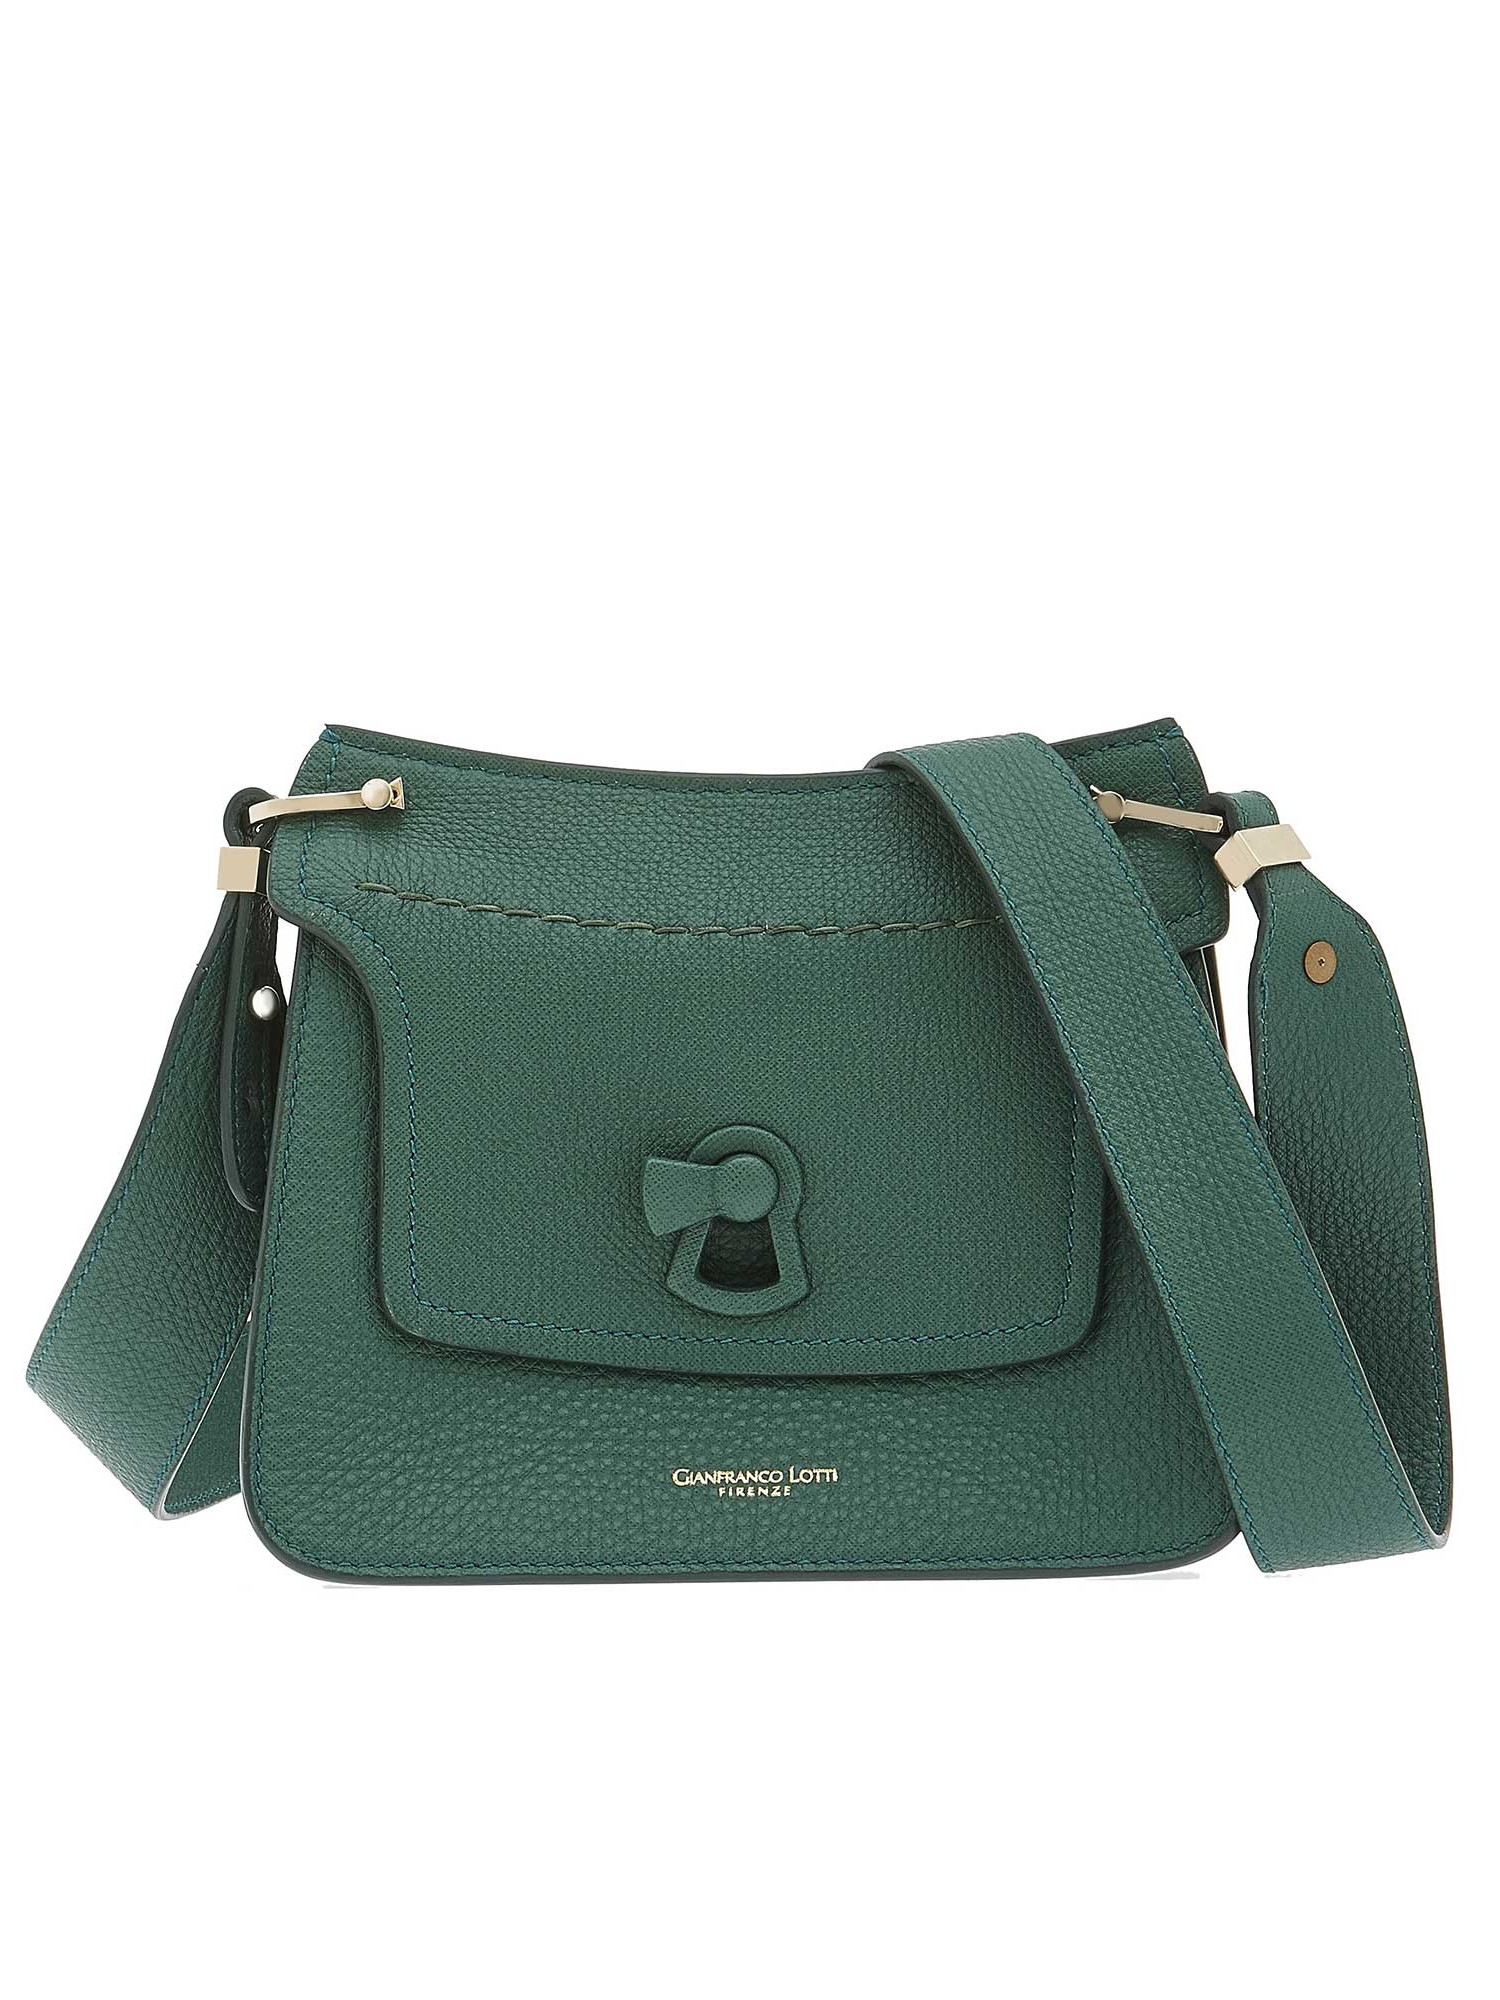 8c5f5414 Gianfranco Lotti - Luxury bags in Florence since 1968